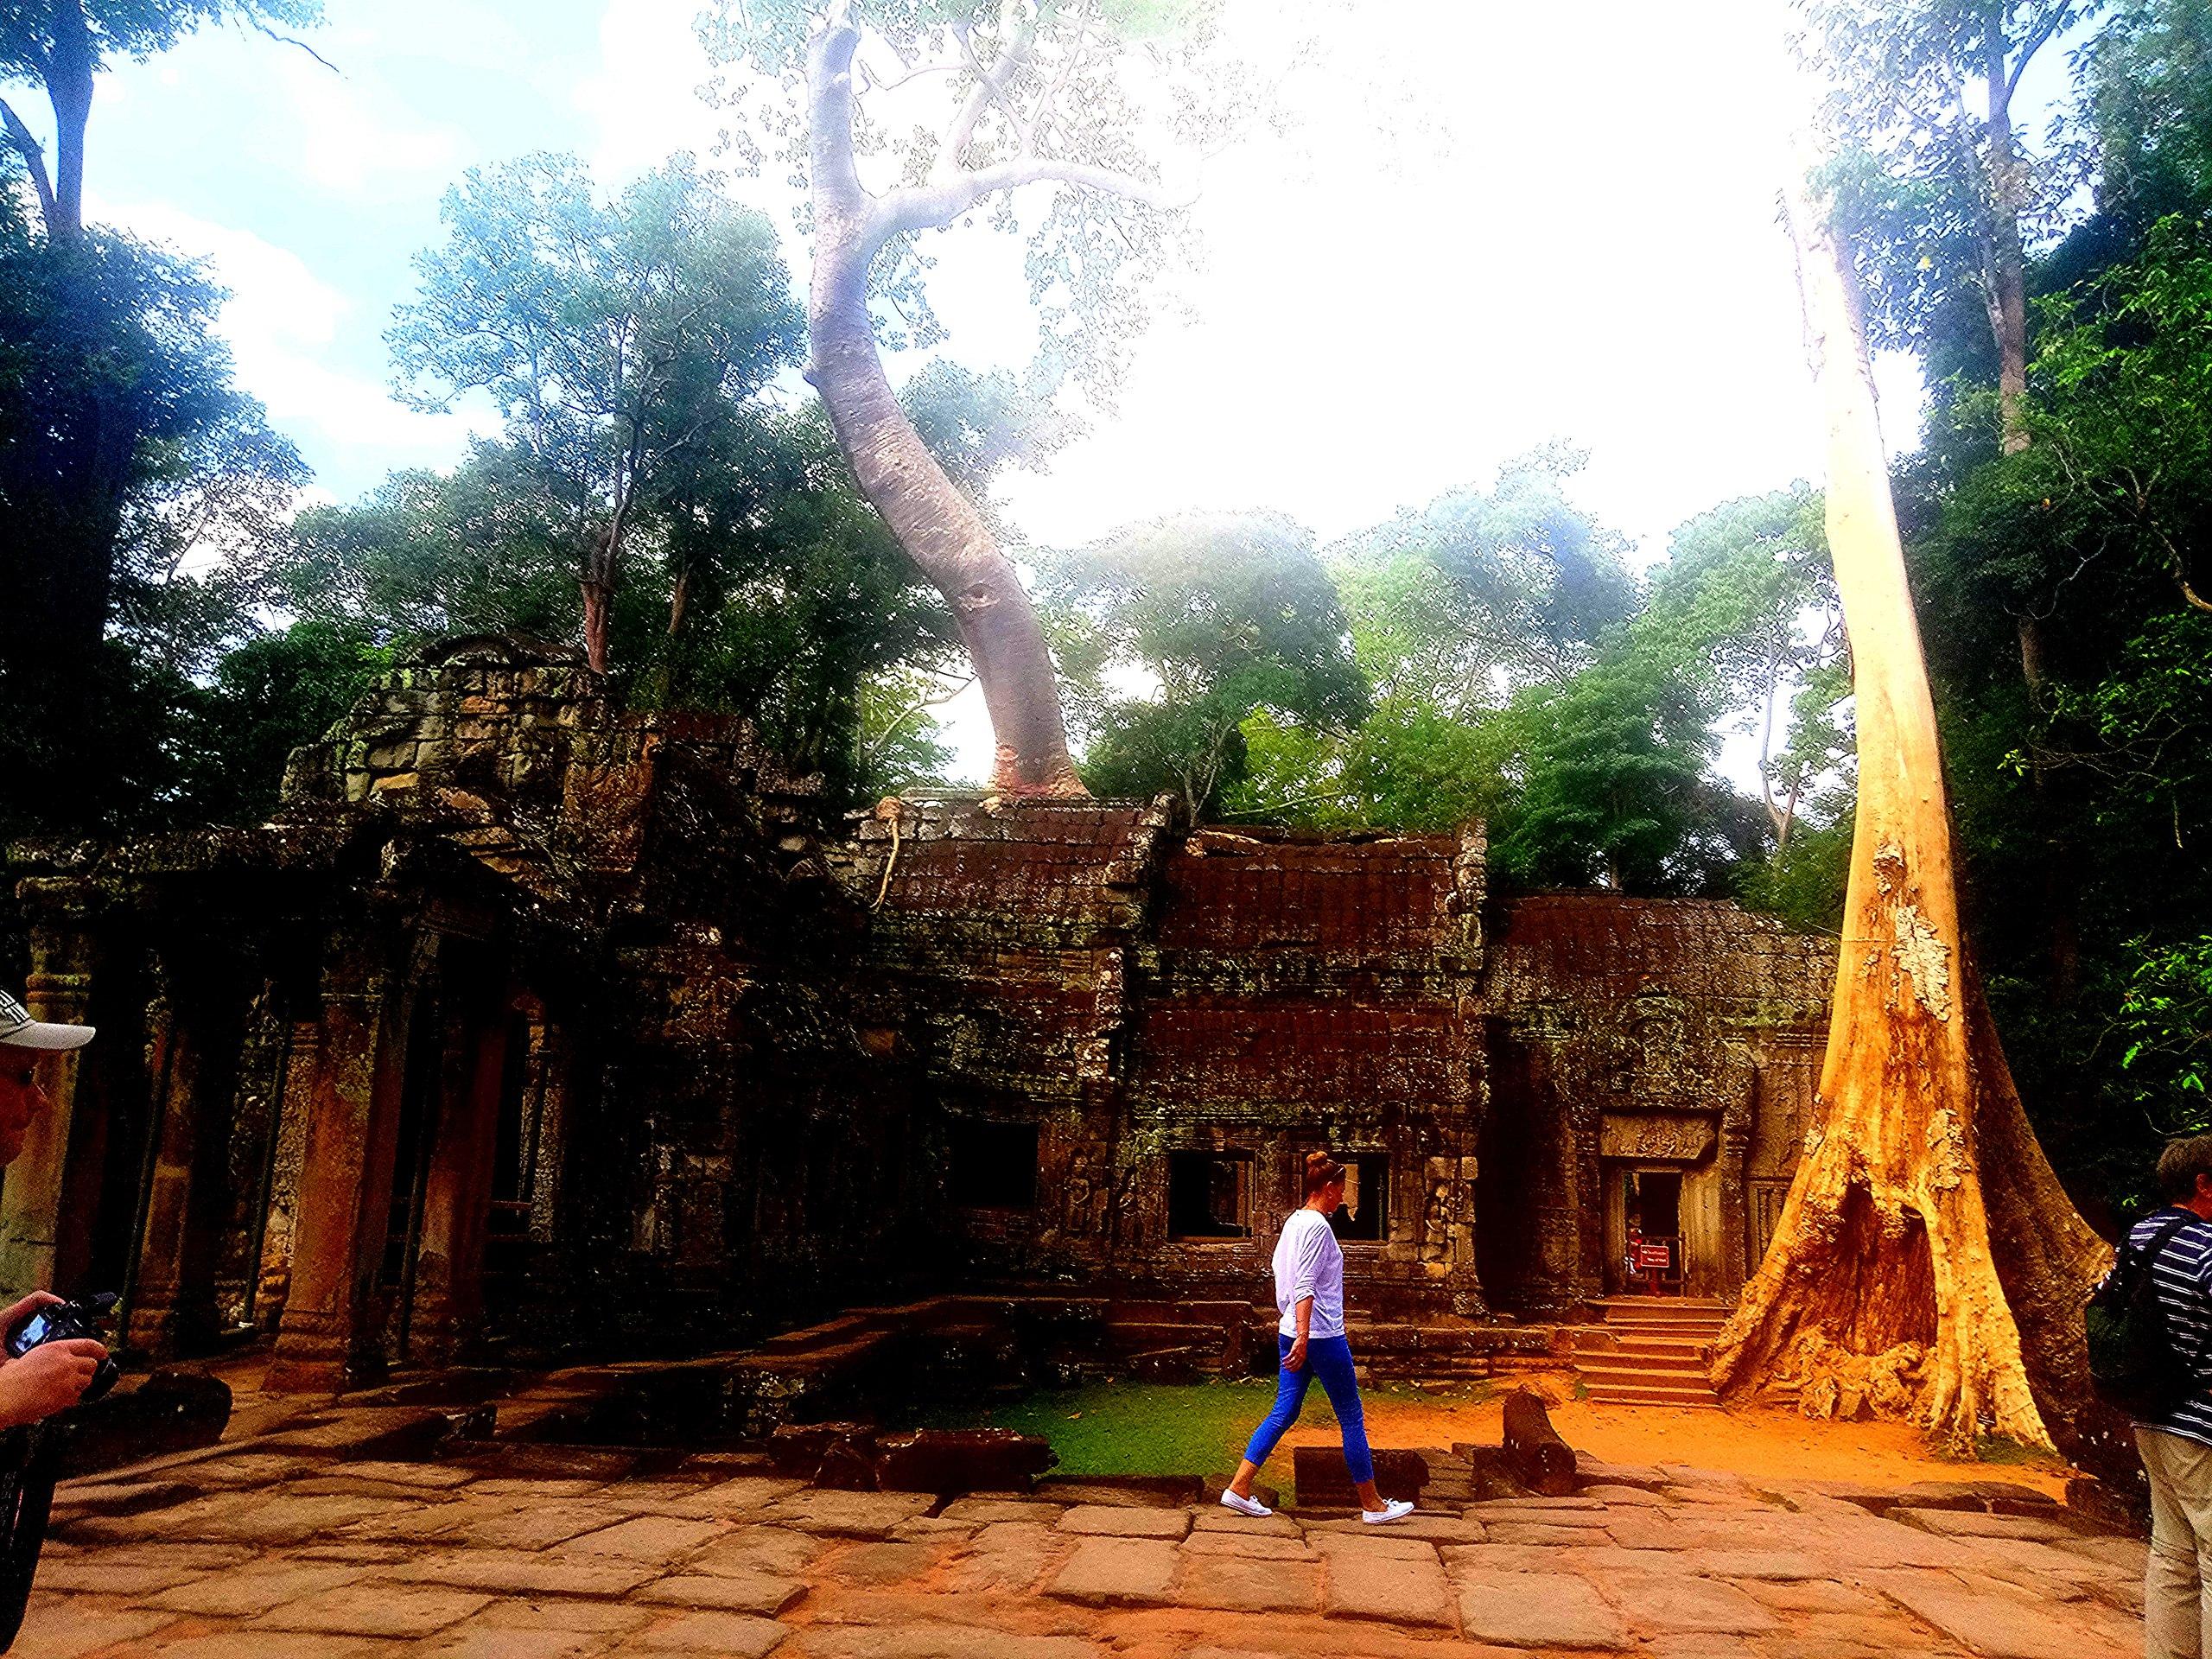 Елена Руденко (Валтея). Камбоджа. Ангкор. - Страница 3 7L6pAK-kmlM